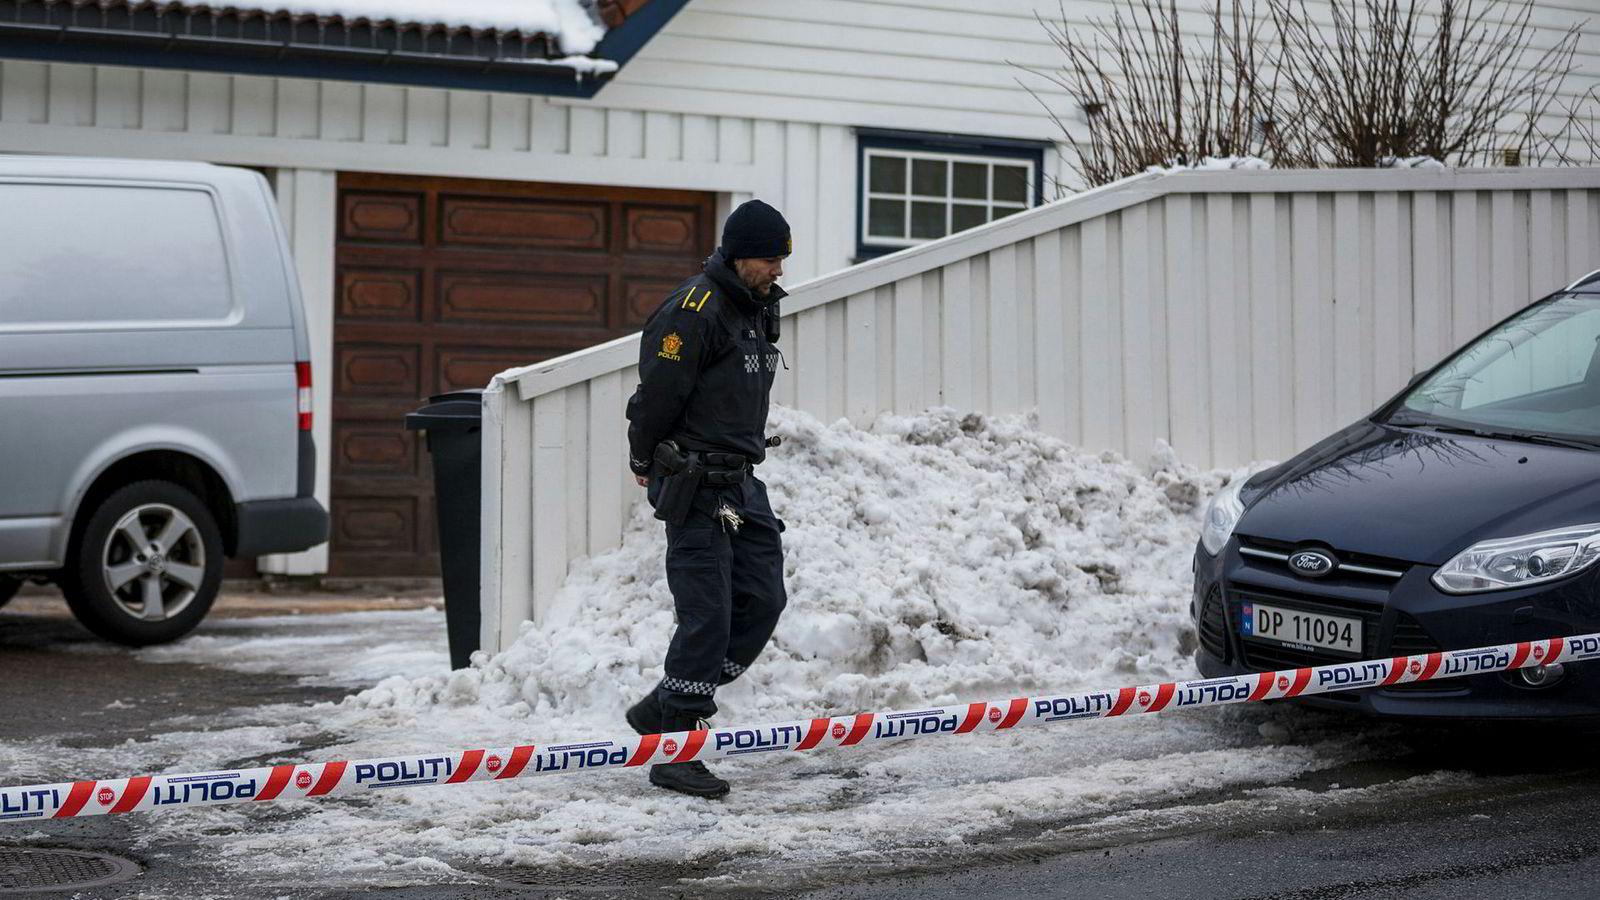 Mens dramaet om justisministeren fylte norske medier, fylte den europeiske menneskerettsdomstol (EMD) 60 år.